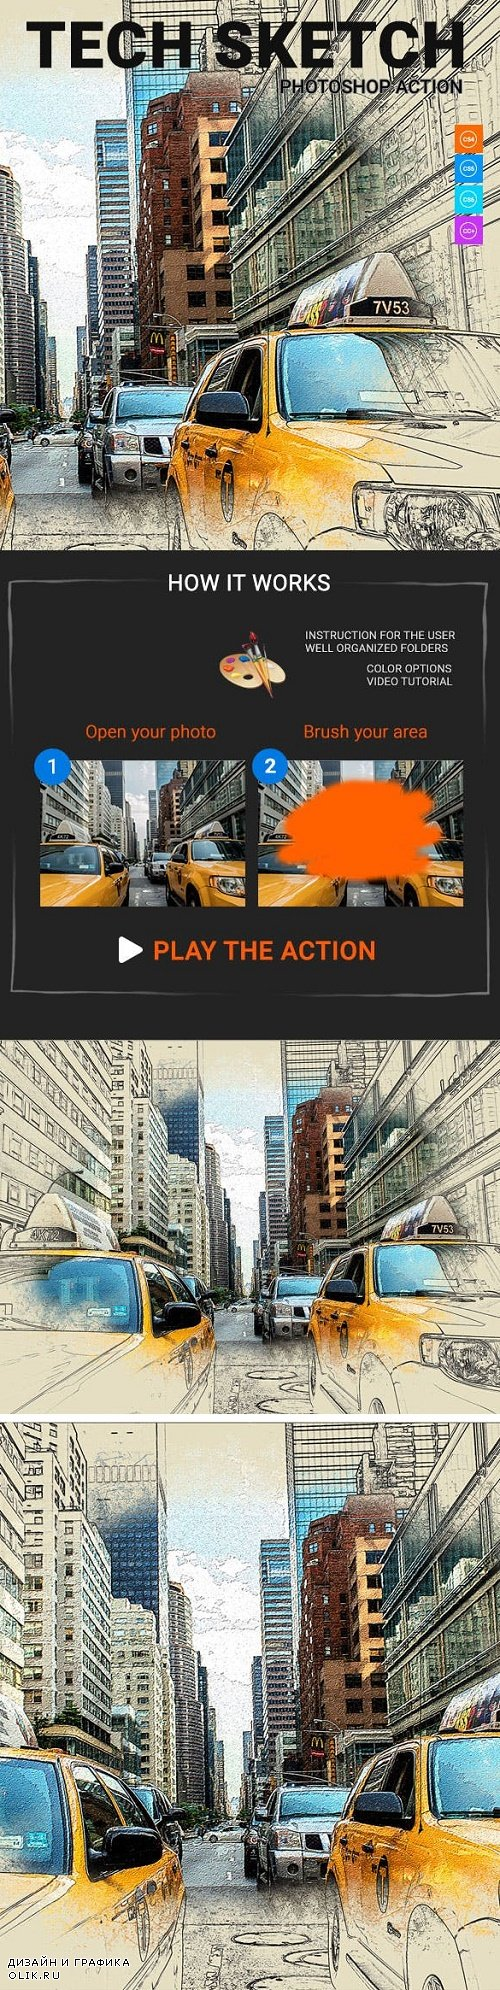 Tech Sketch Photoshop Action - 20729681